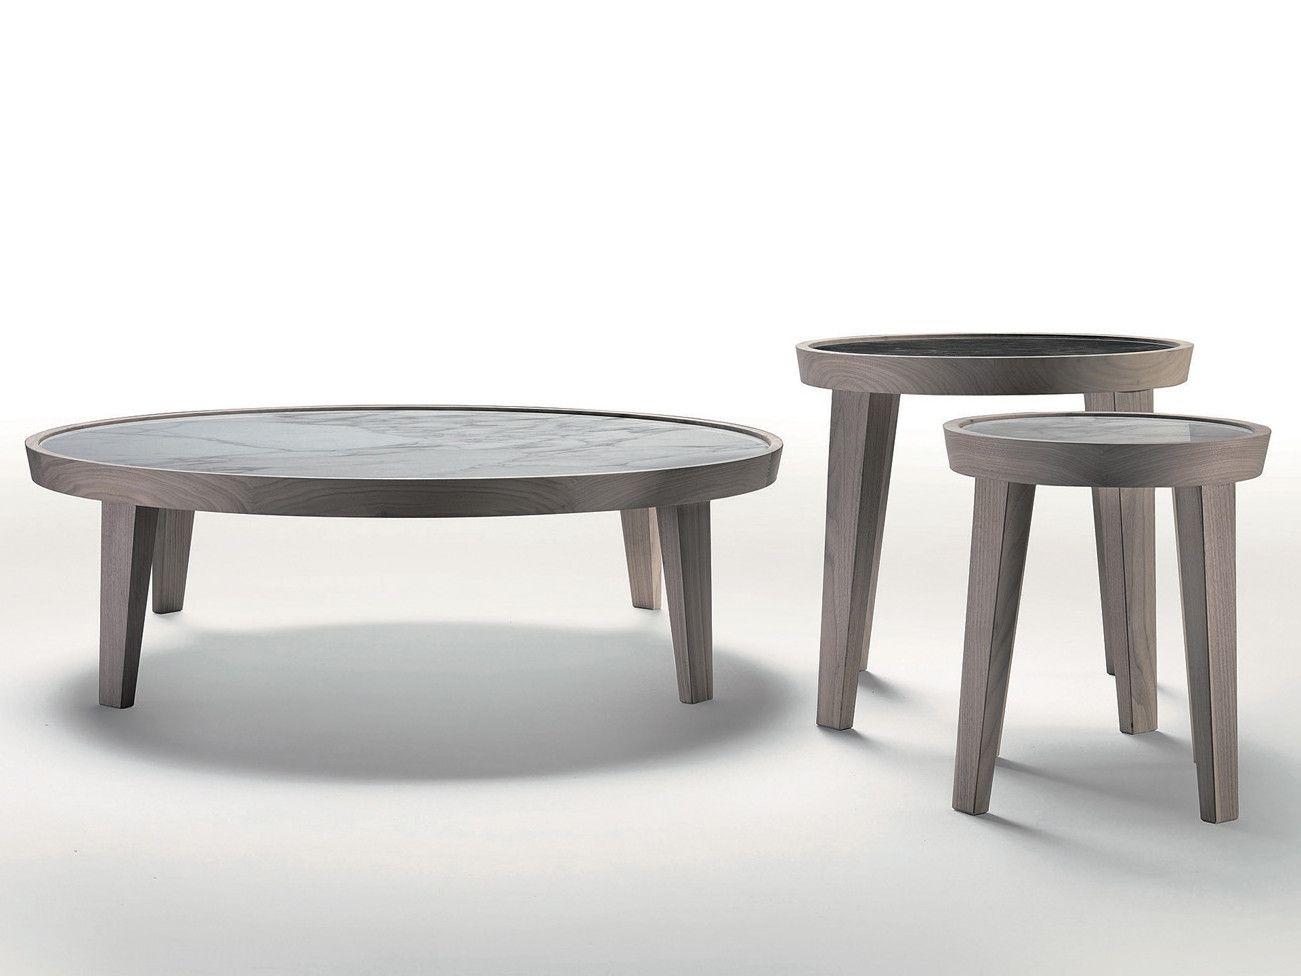 Dida Products Flexform En Coffee Table Round Coffee Table Marble Round Coffee Table [ 976 x 1301 Pixel ]